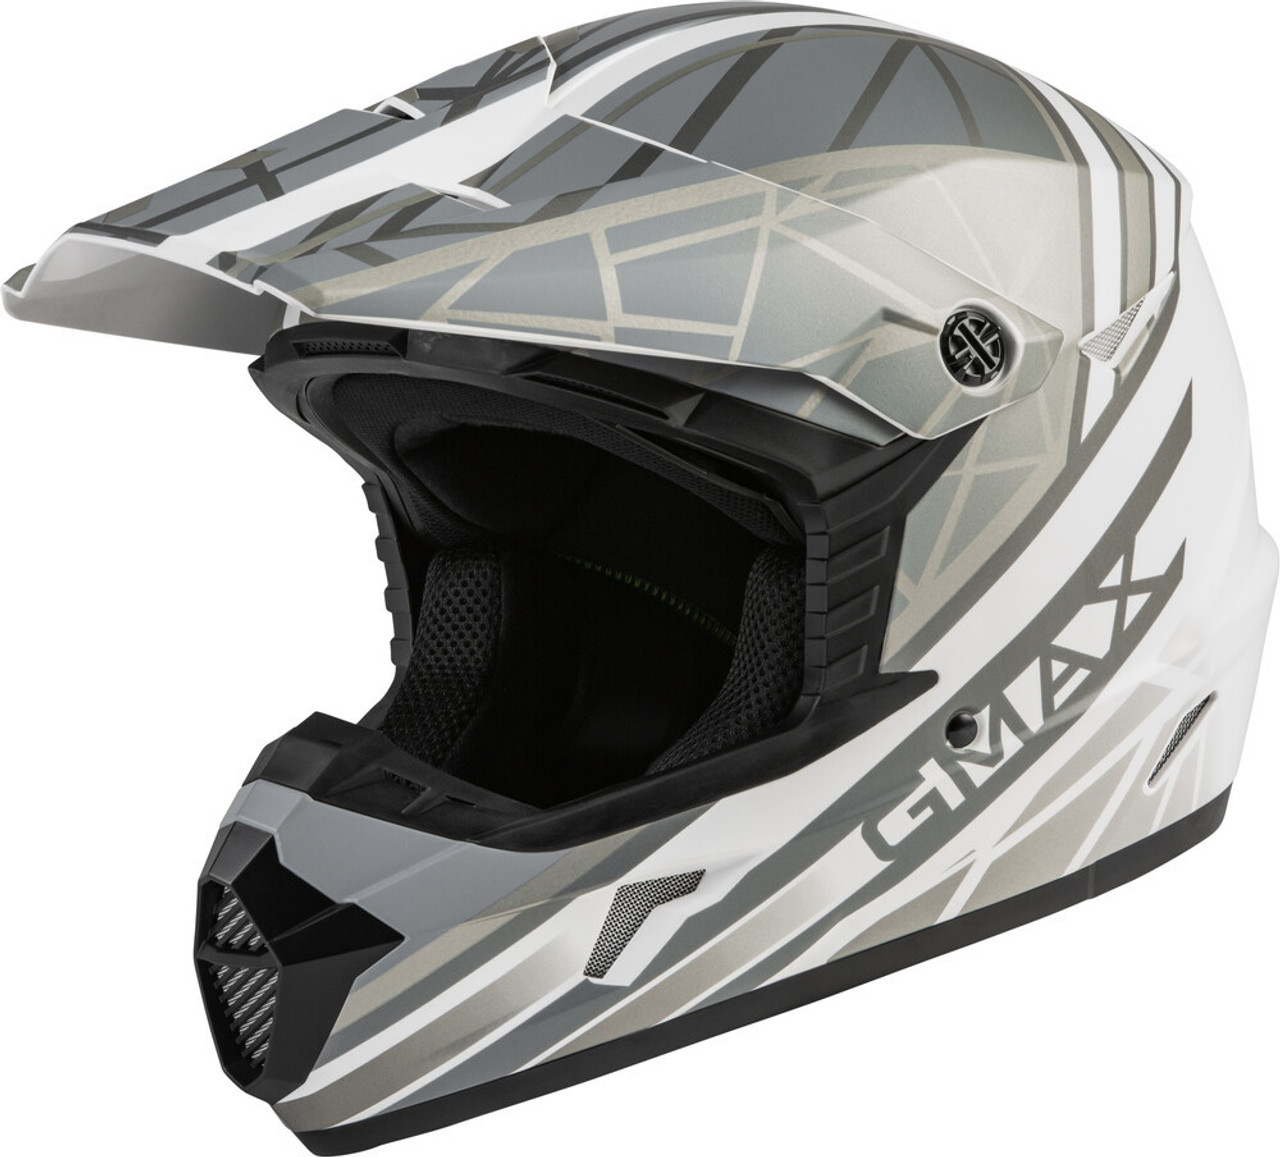 GMAX MX-46Y Mega Off-Road Youth Helmet Matte White/Silver